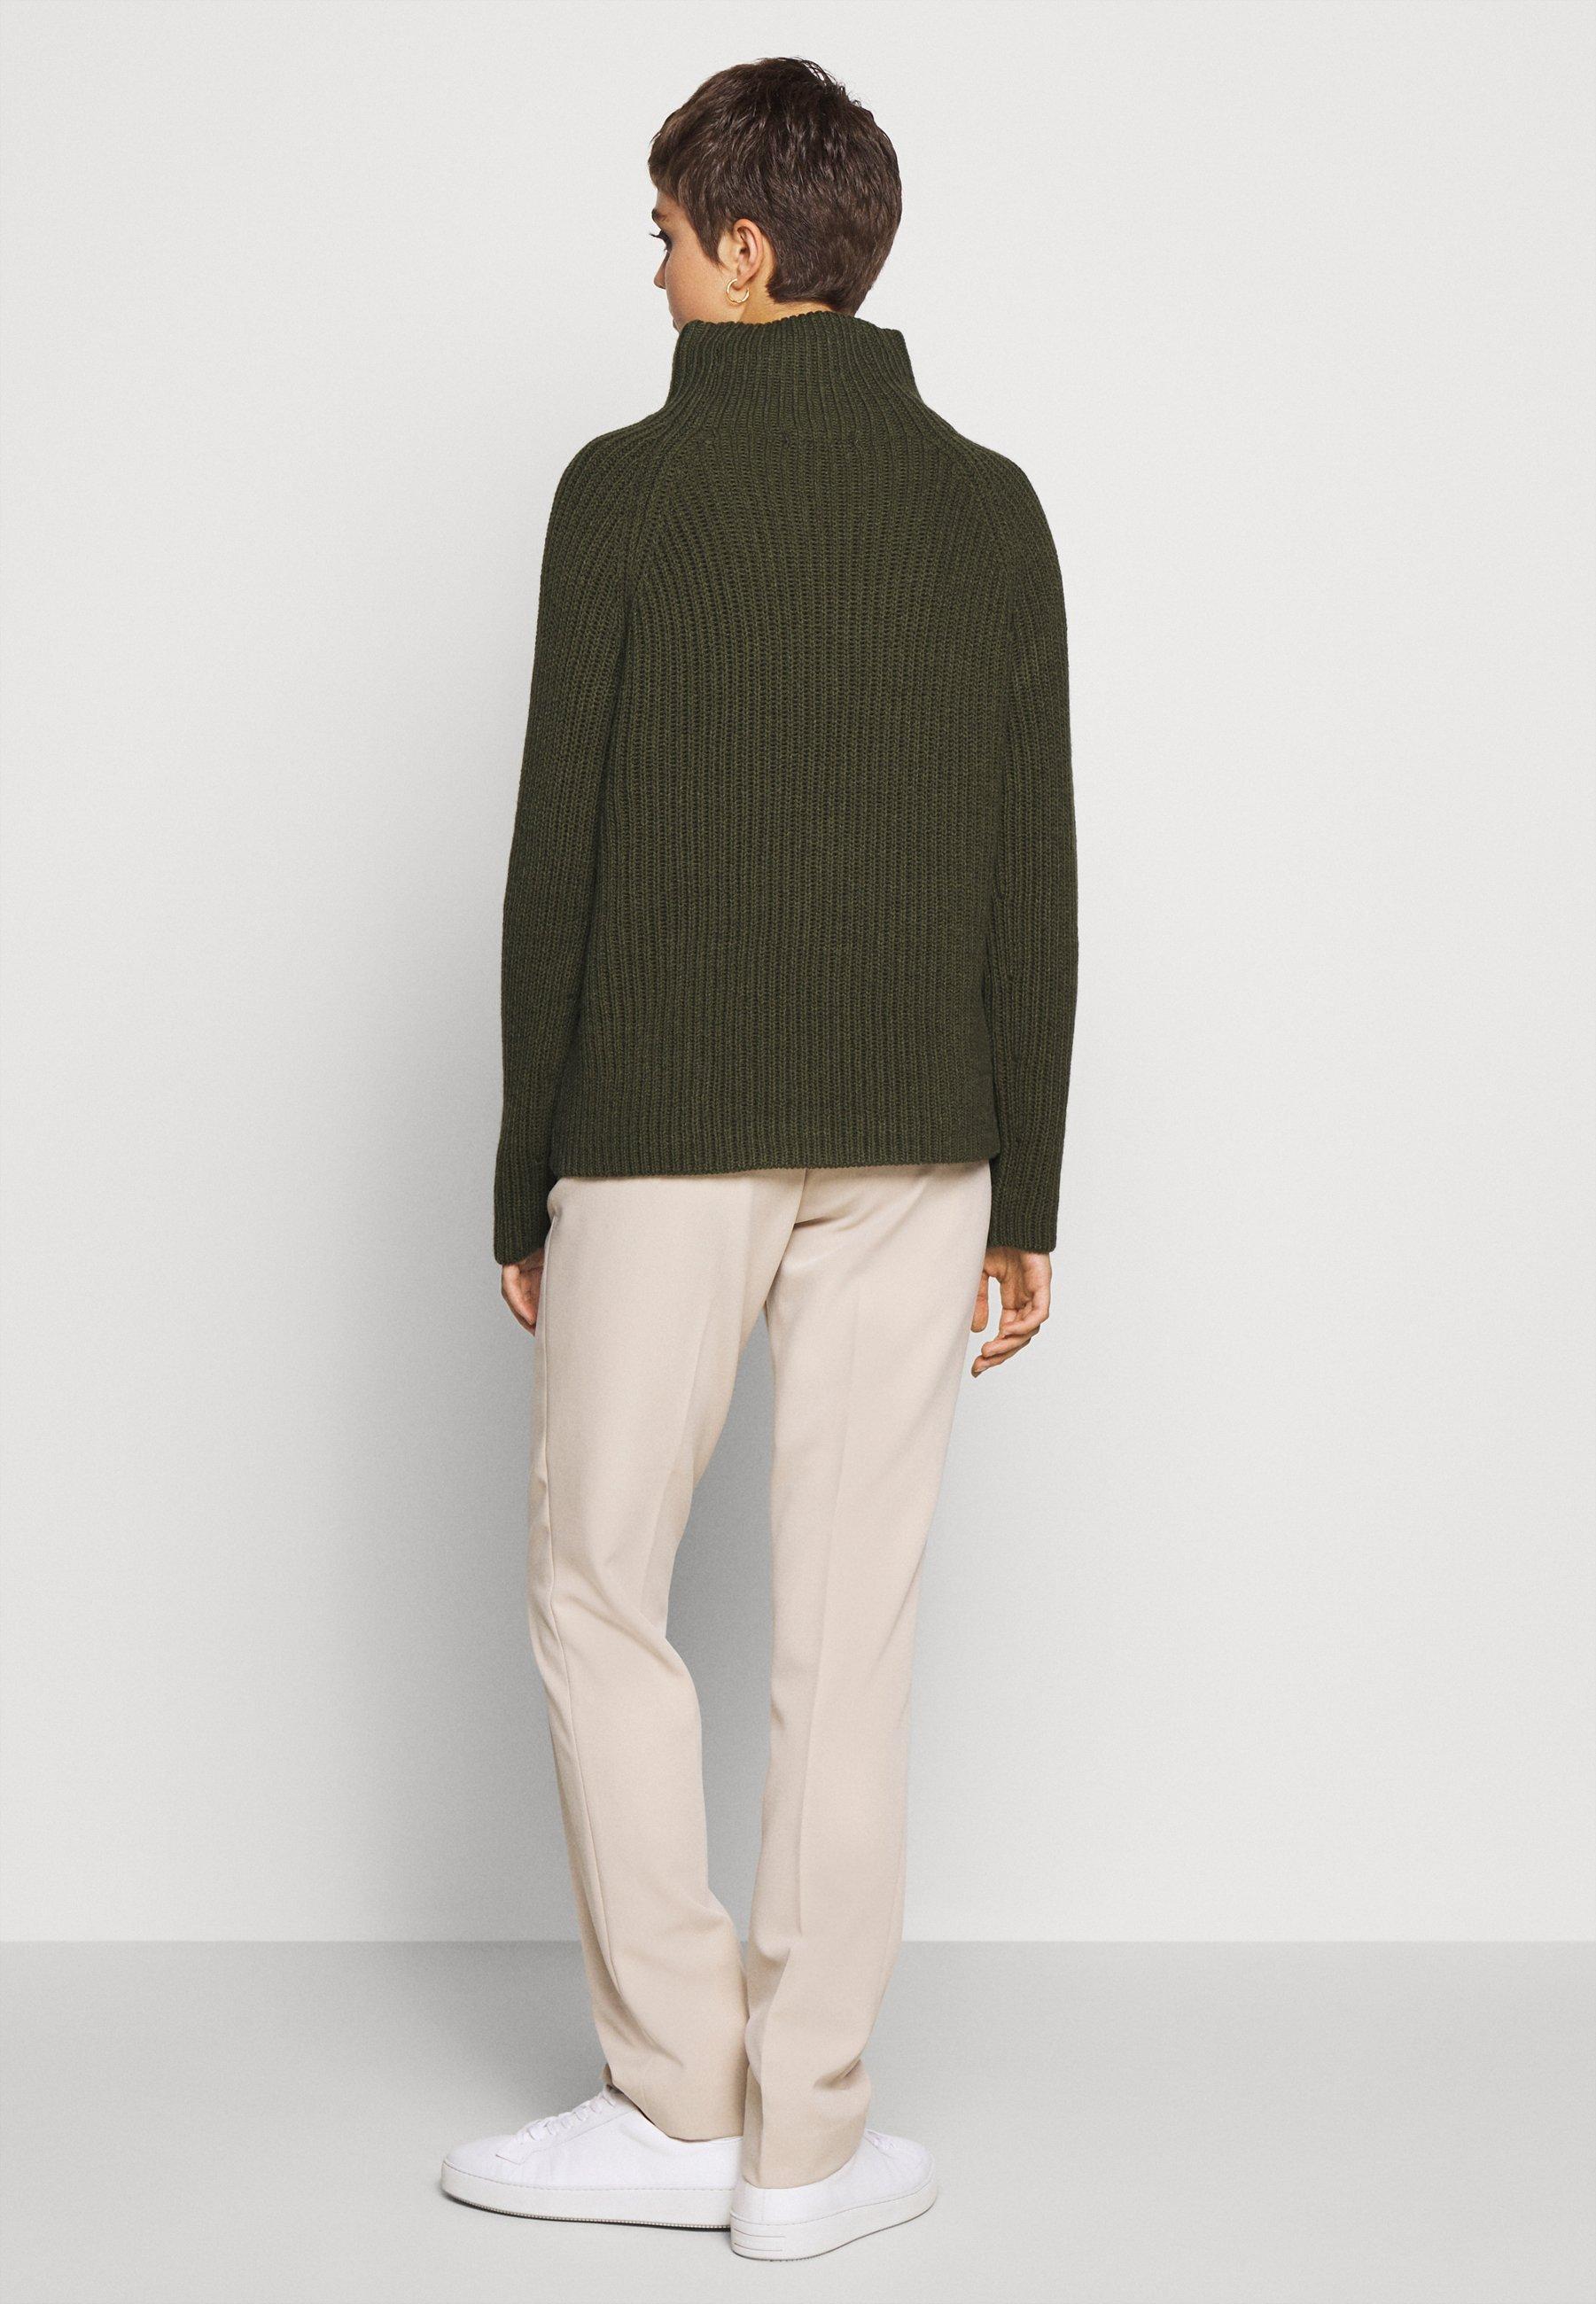 DRYKORN ARWEN - Pullover - grün - Pulls & Gilets Femme sPqqo